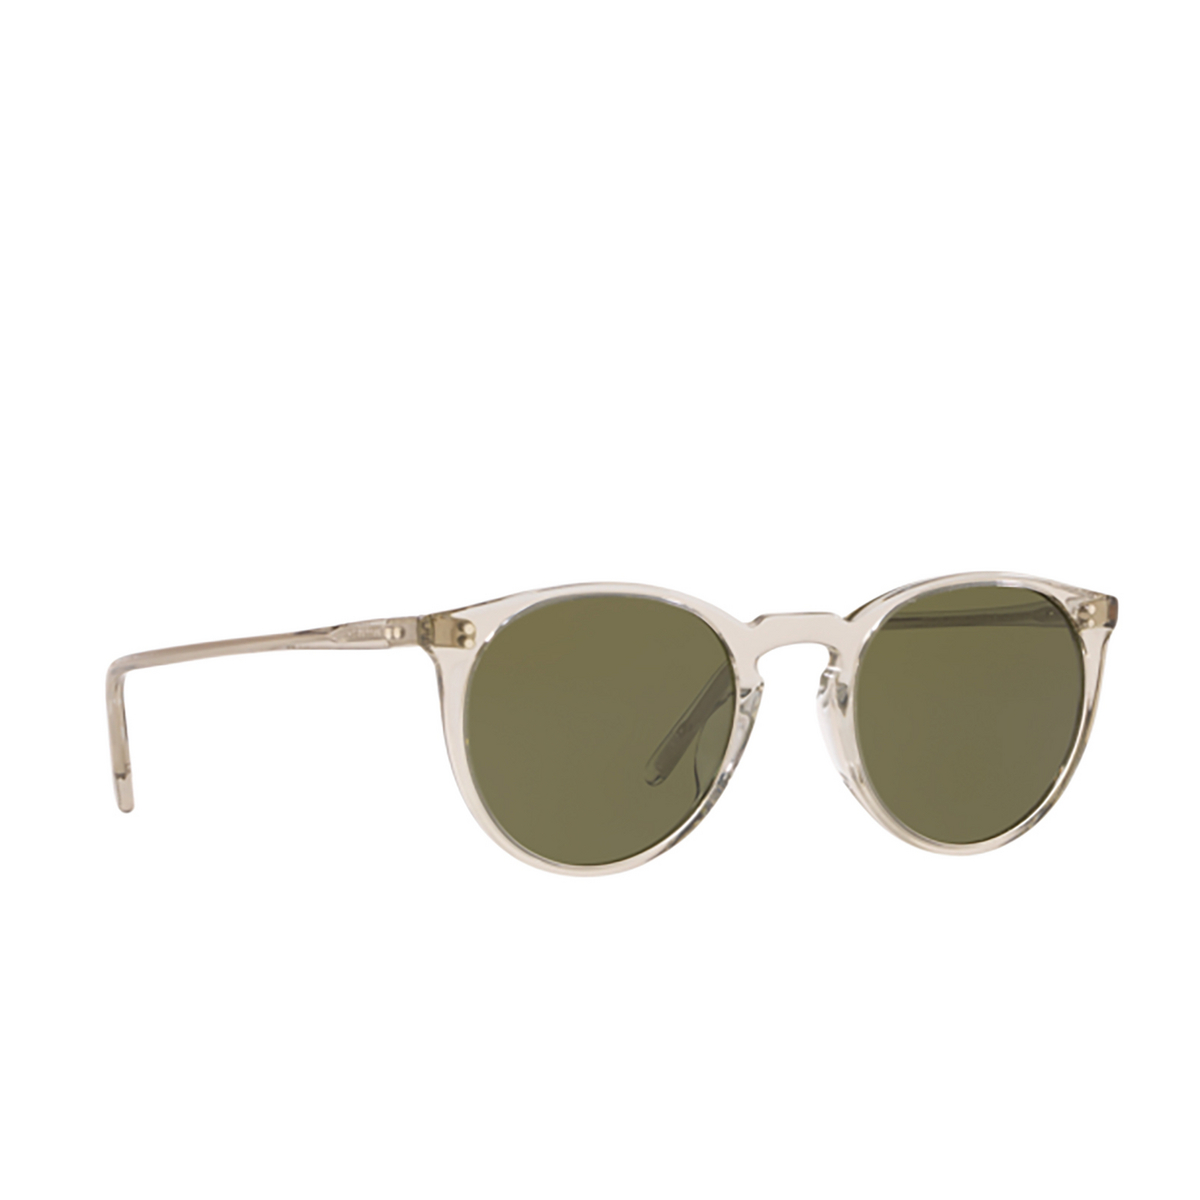 Oliver Peoples® Round Sunglasses: O'malley Sun OV5183S color Black Diamond 166952 - three-quarters view.